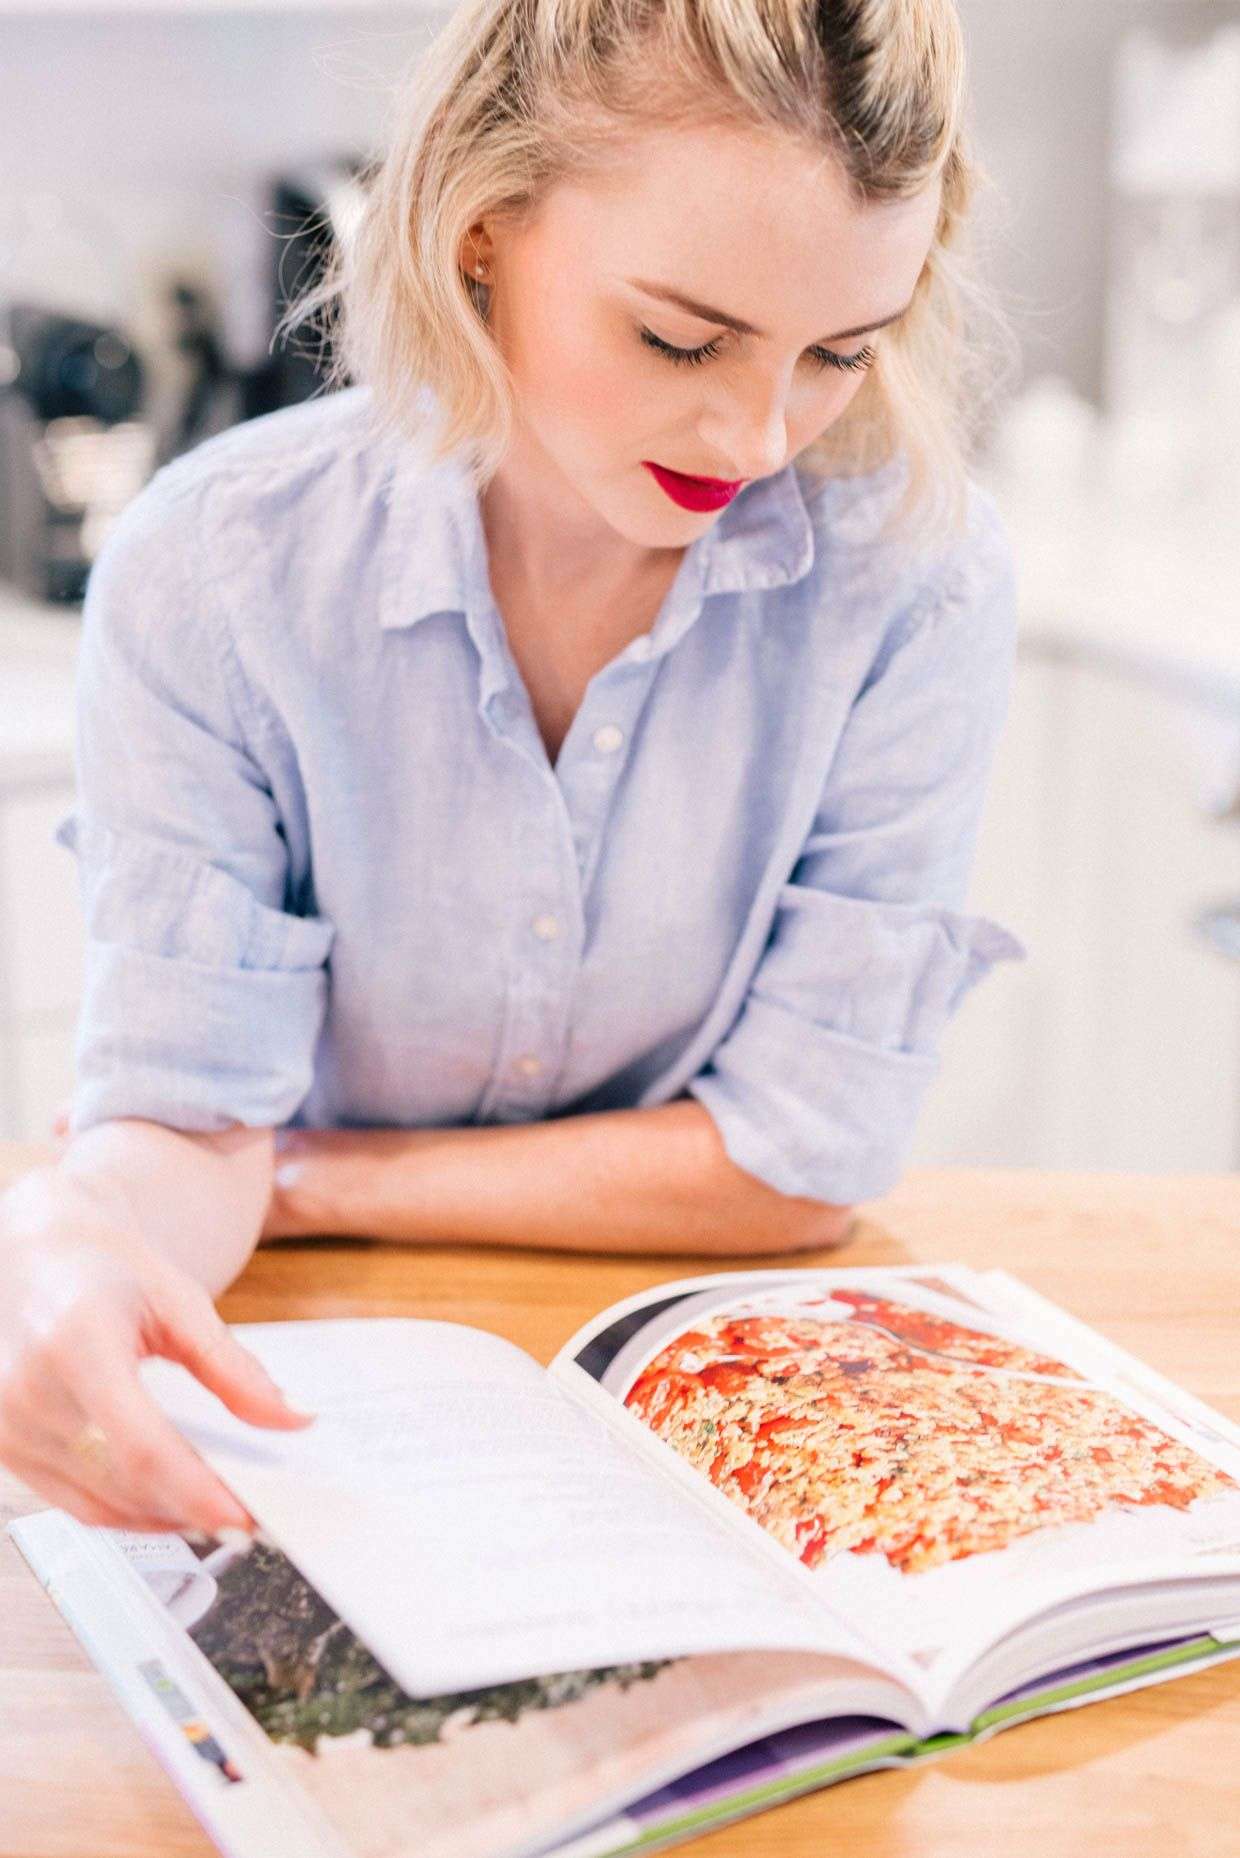 My 3 Favorite Super Easy Pescatarian Recipes | Poor Little It Girl #poorlittleitgirl #pescatarian #recipes #easydinner #pescatarianrecipes